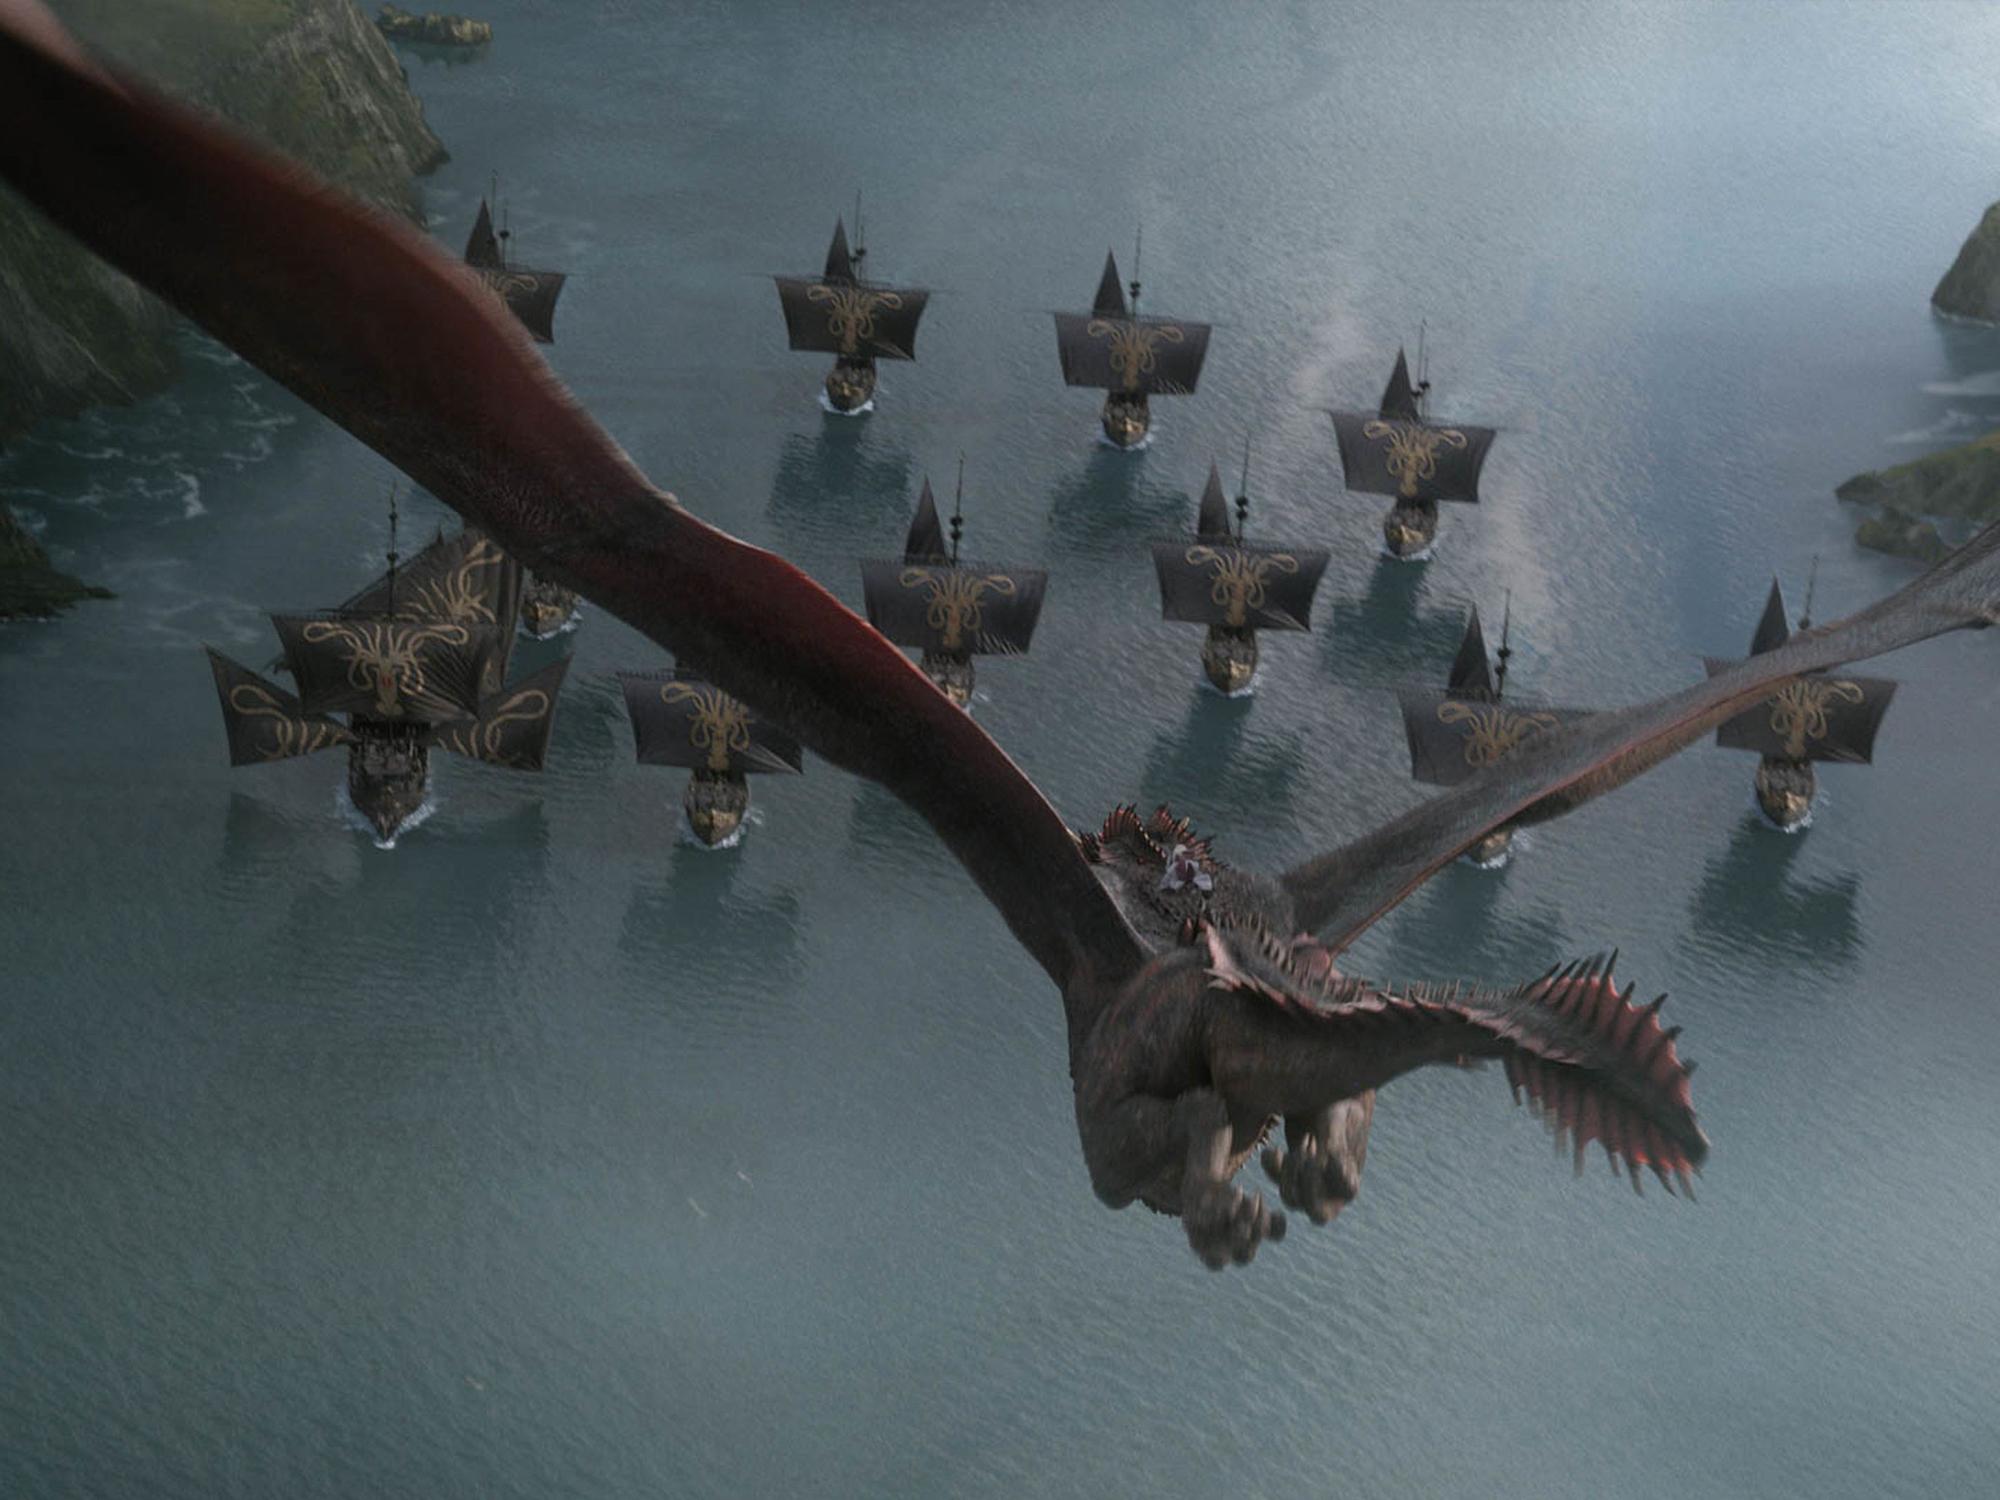 Game-of-Thrones-Season-8-The-Last-of-the-Starks.jpg